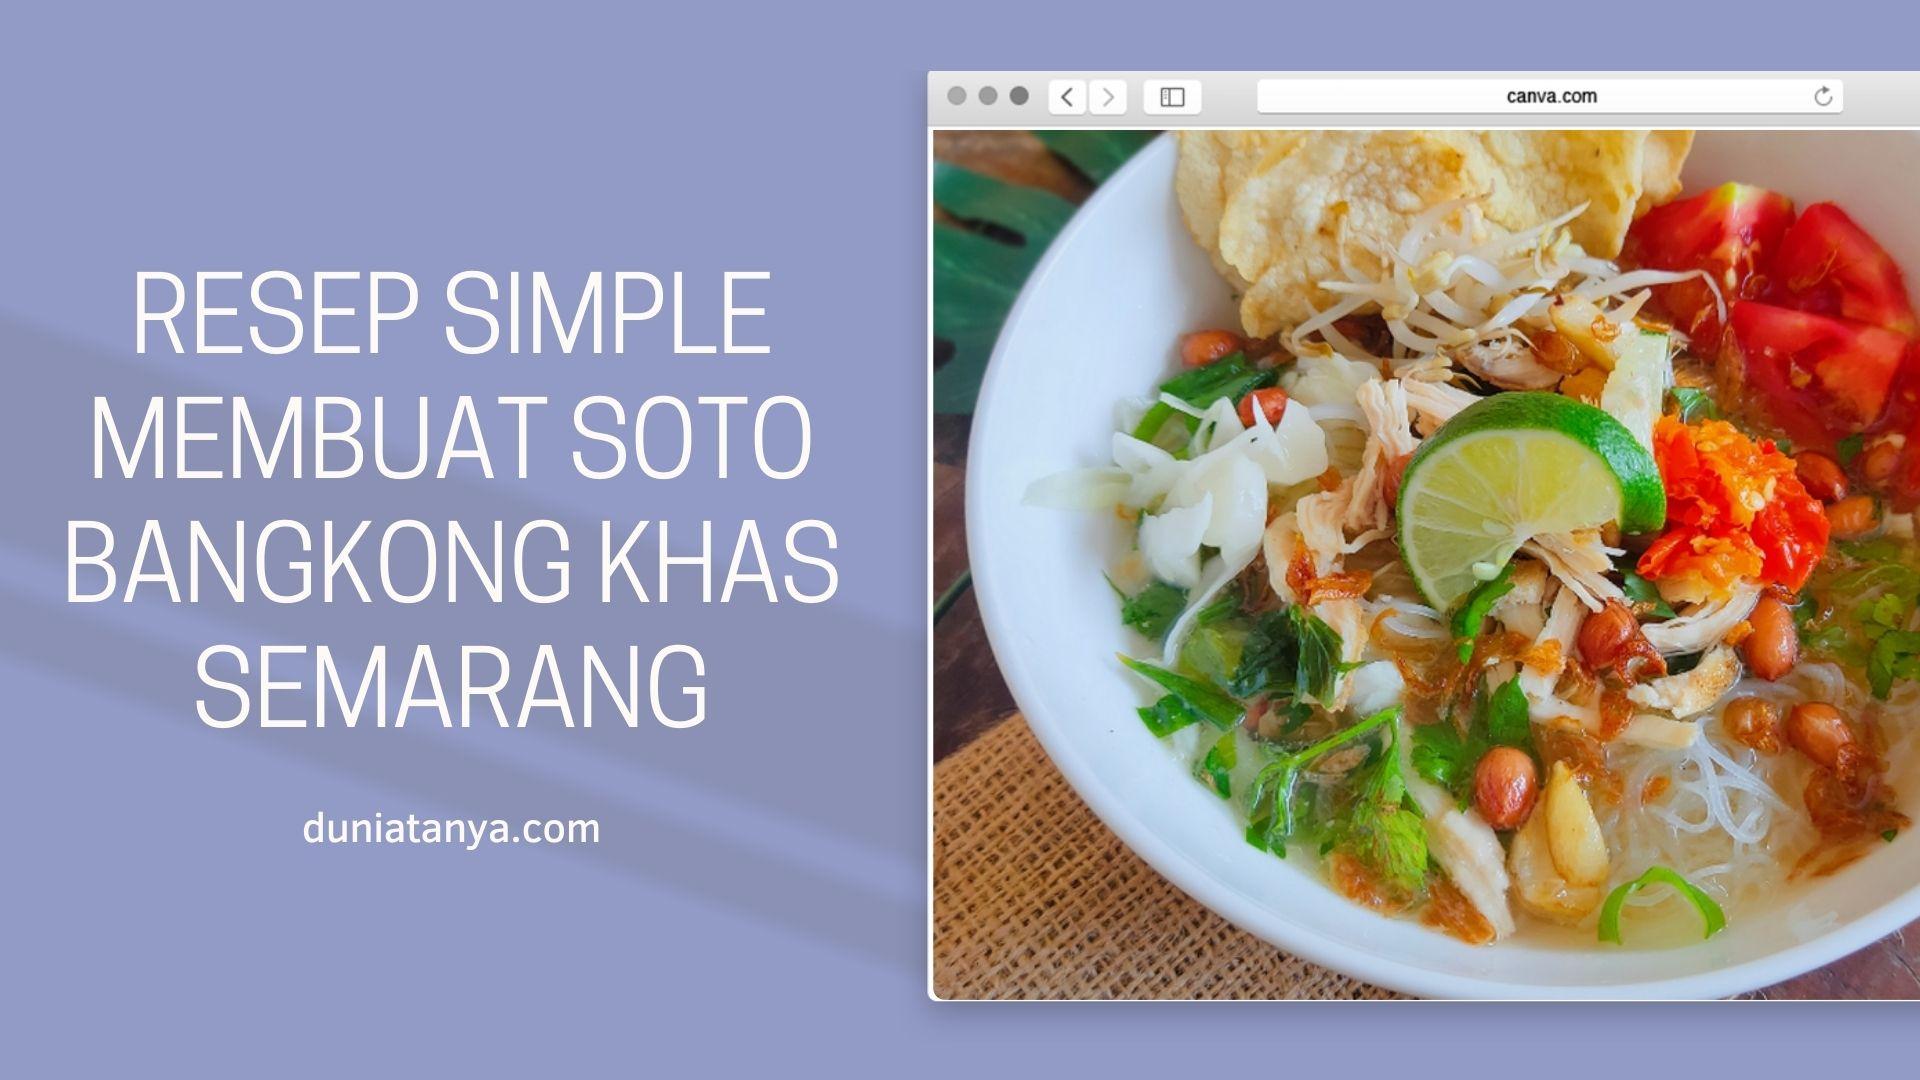 You are currently viewing Resep Simple Membuat Soto Bangkong Khas Semarang